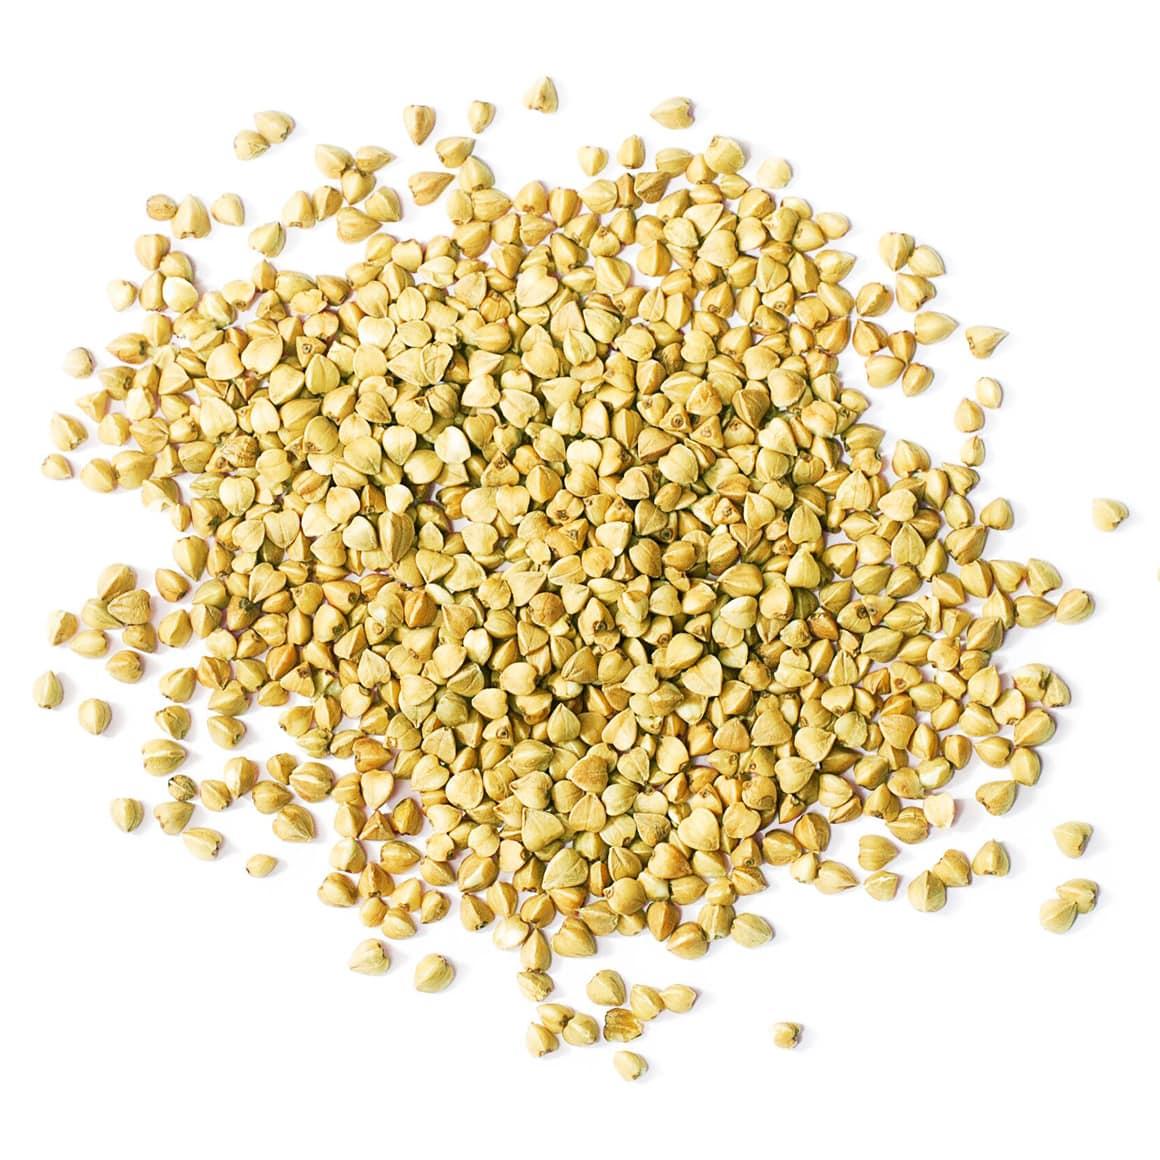 Organic Buckwheat Groats